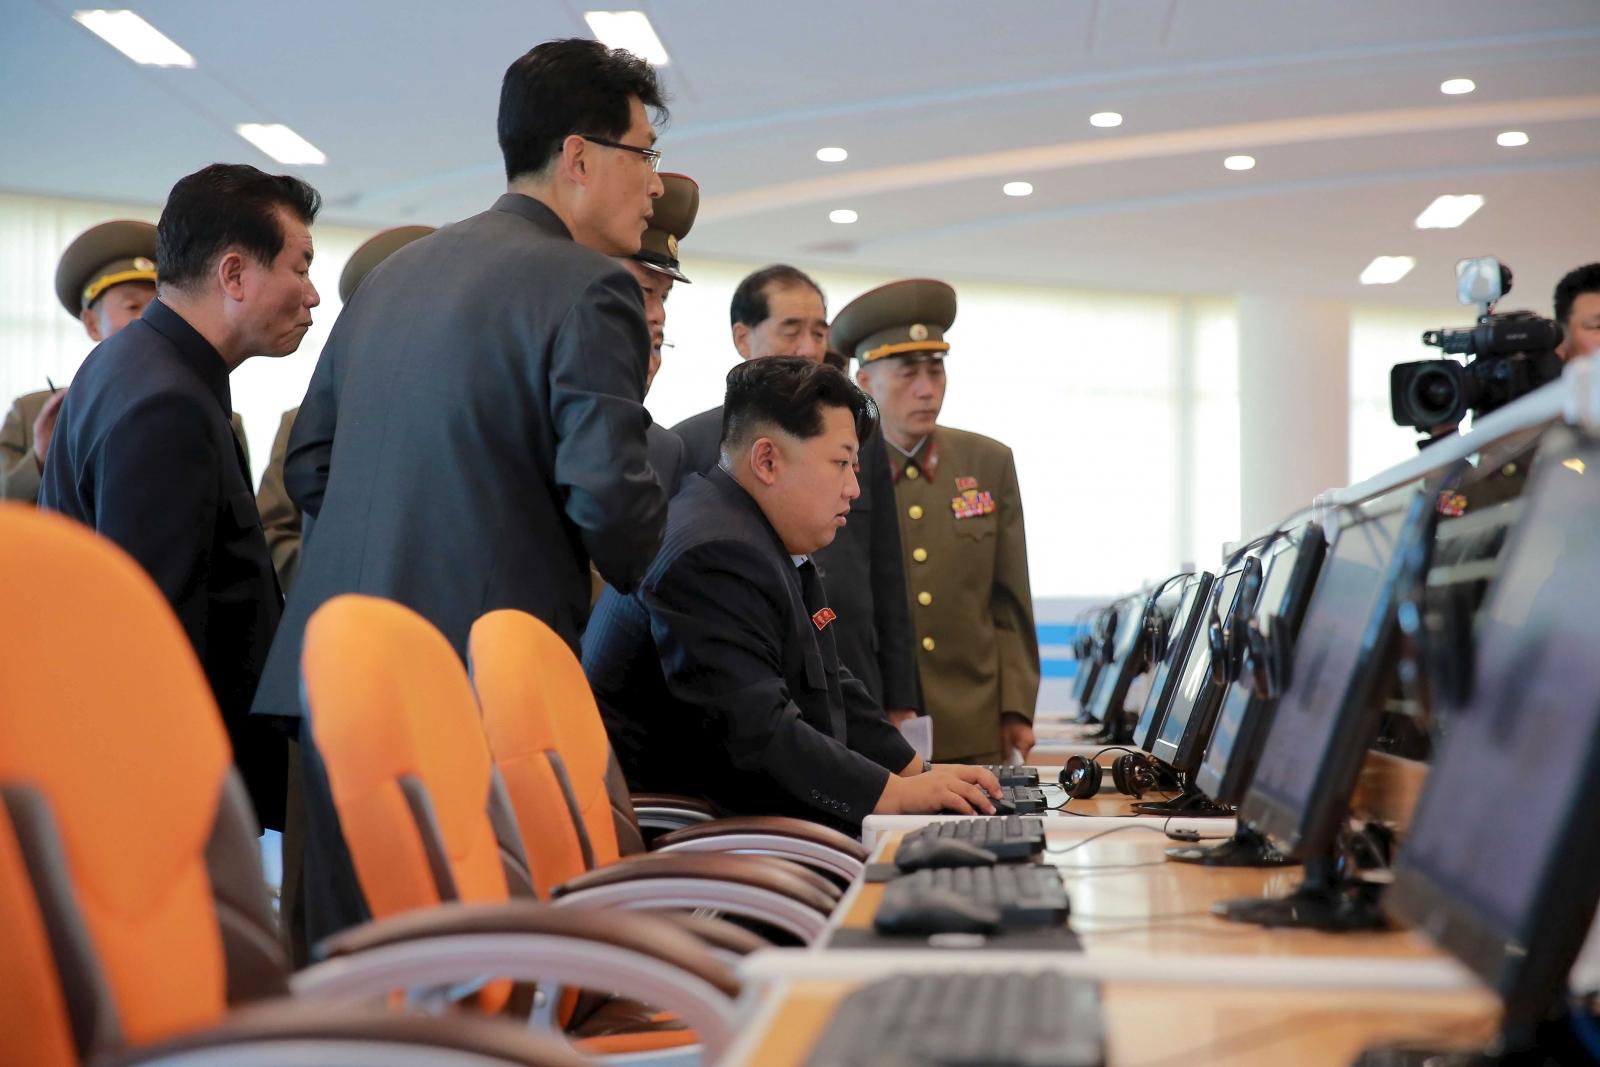 Kim Jong Un uses a computer